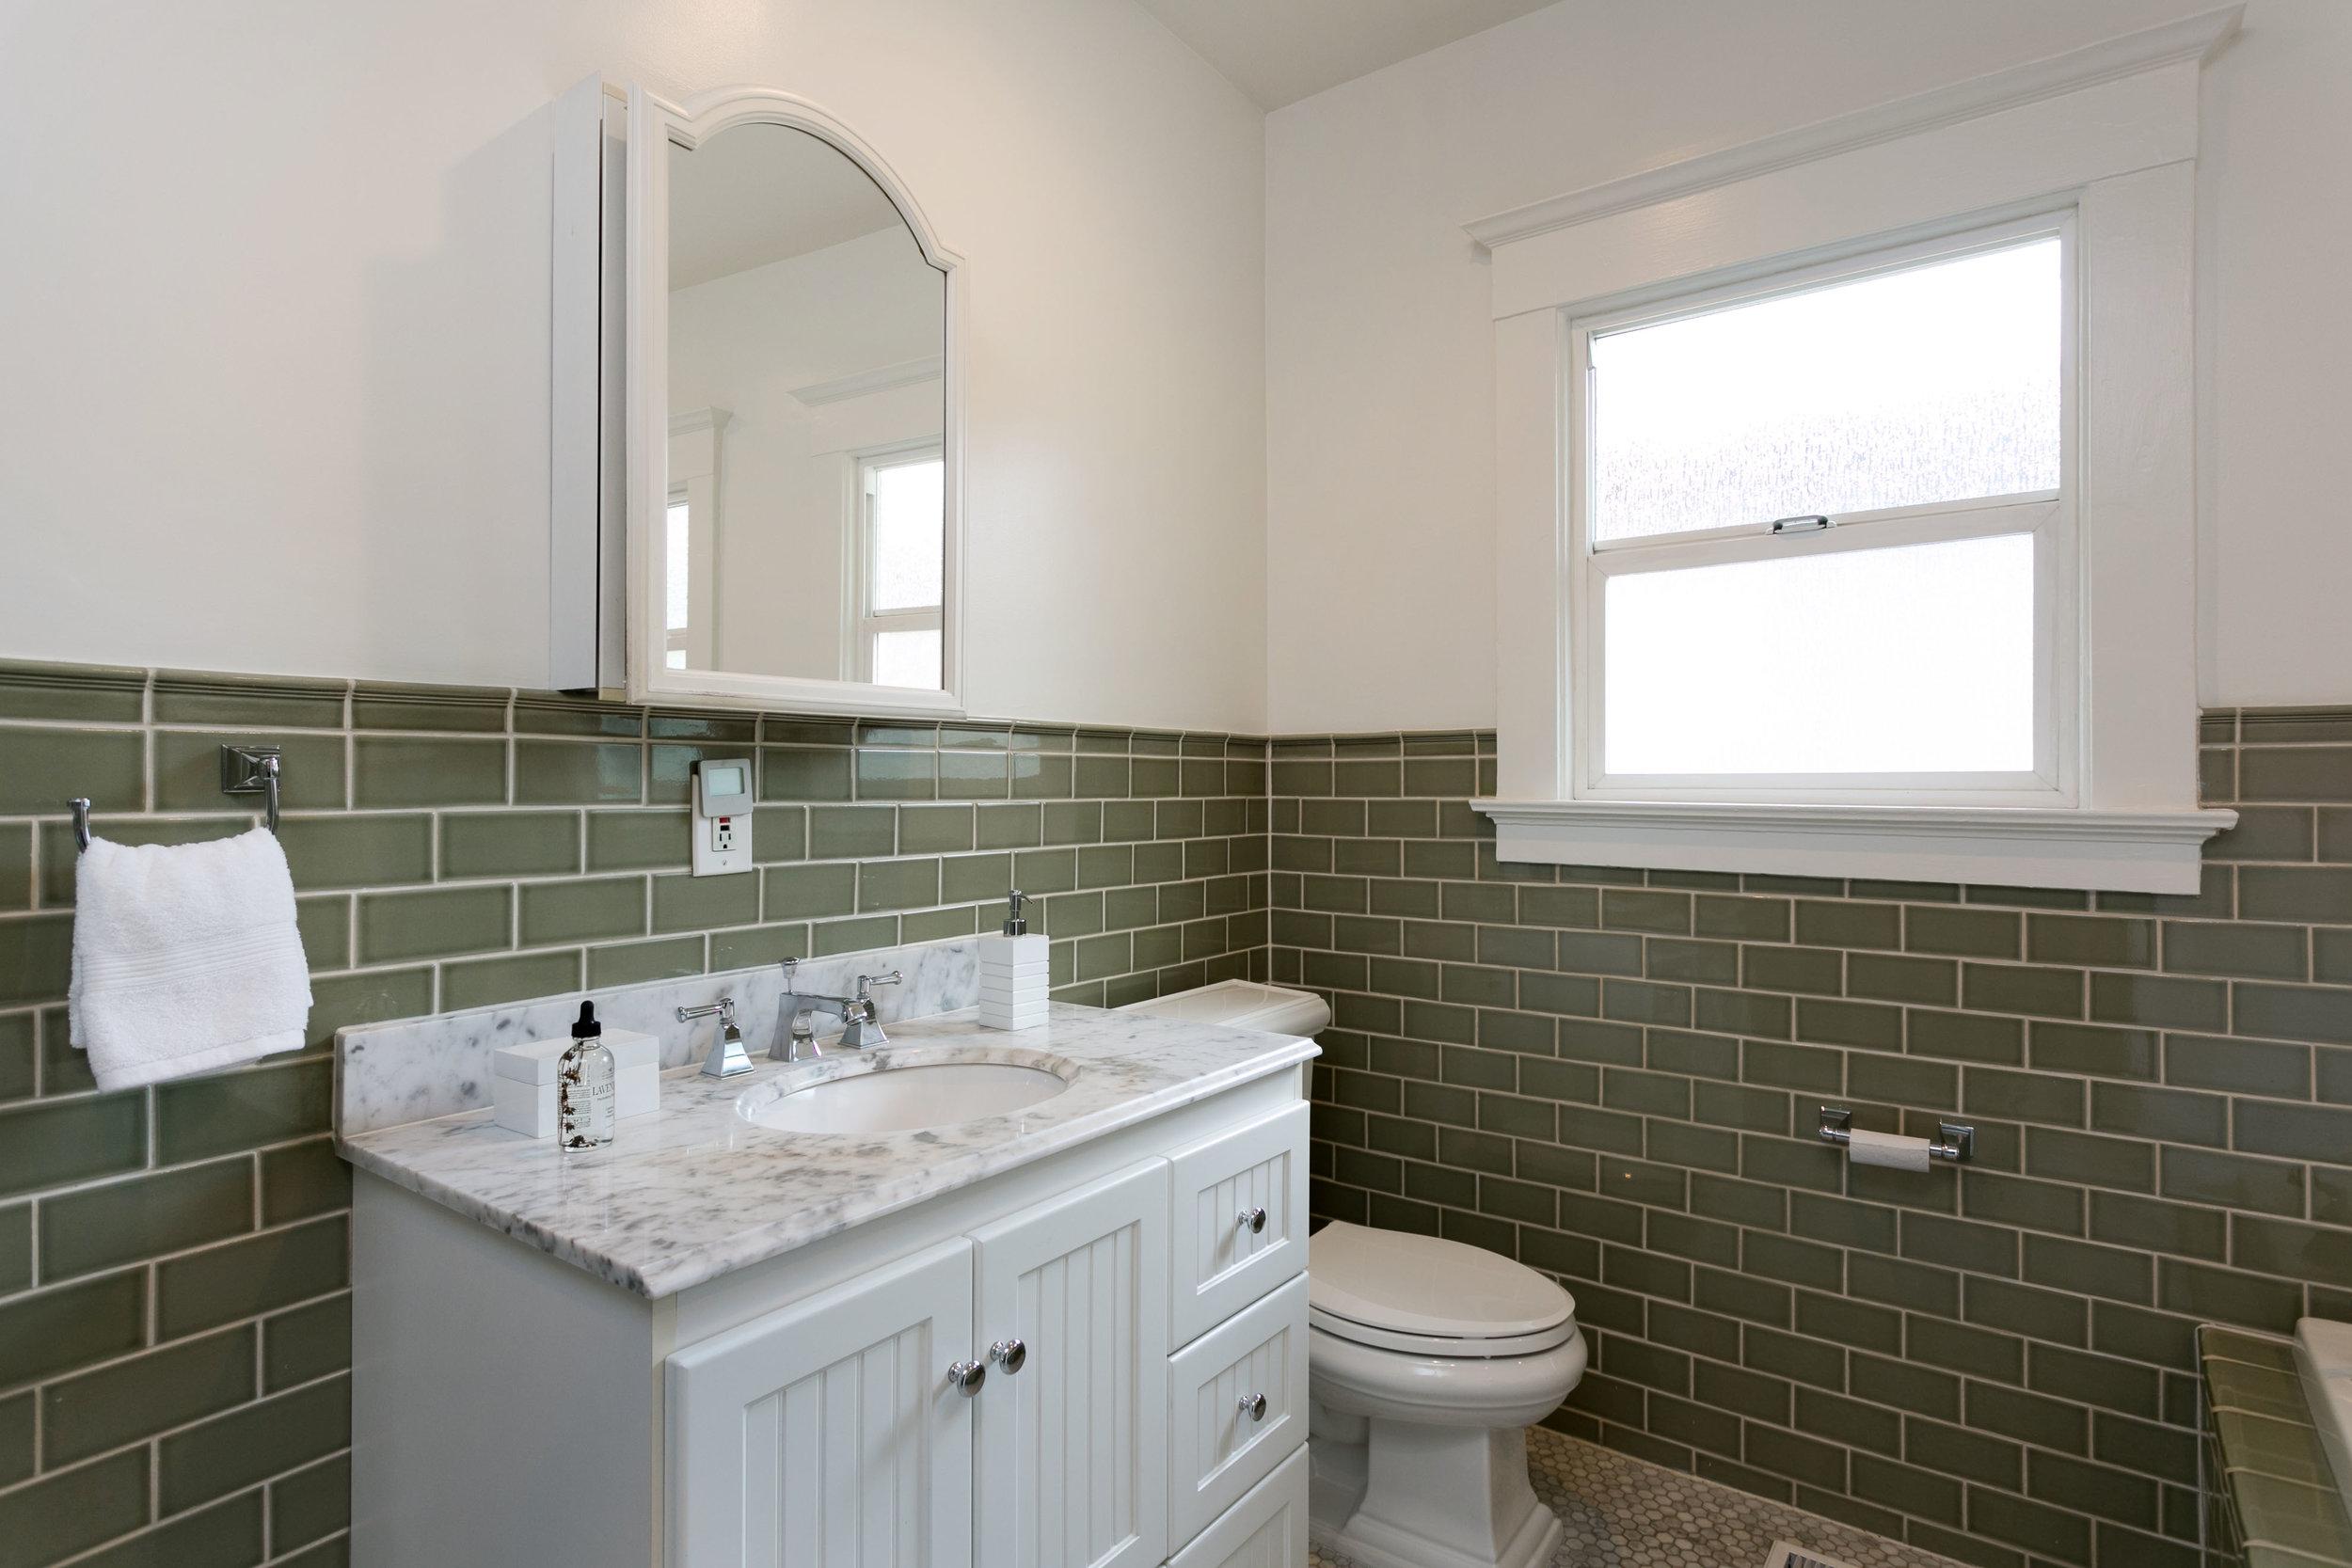 22 bath sink.jpg